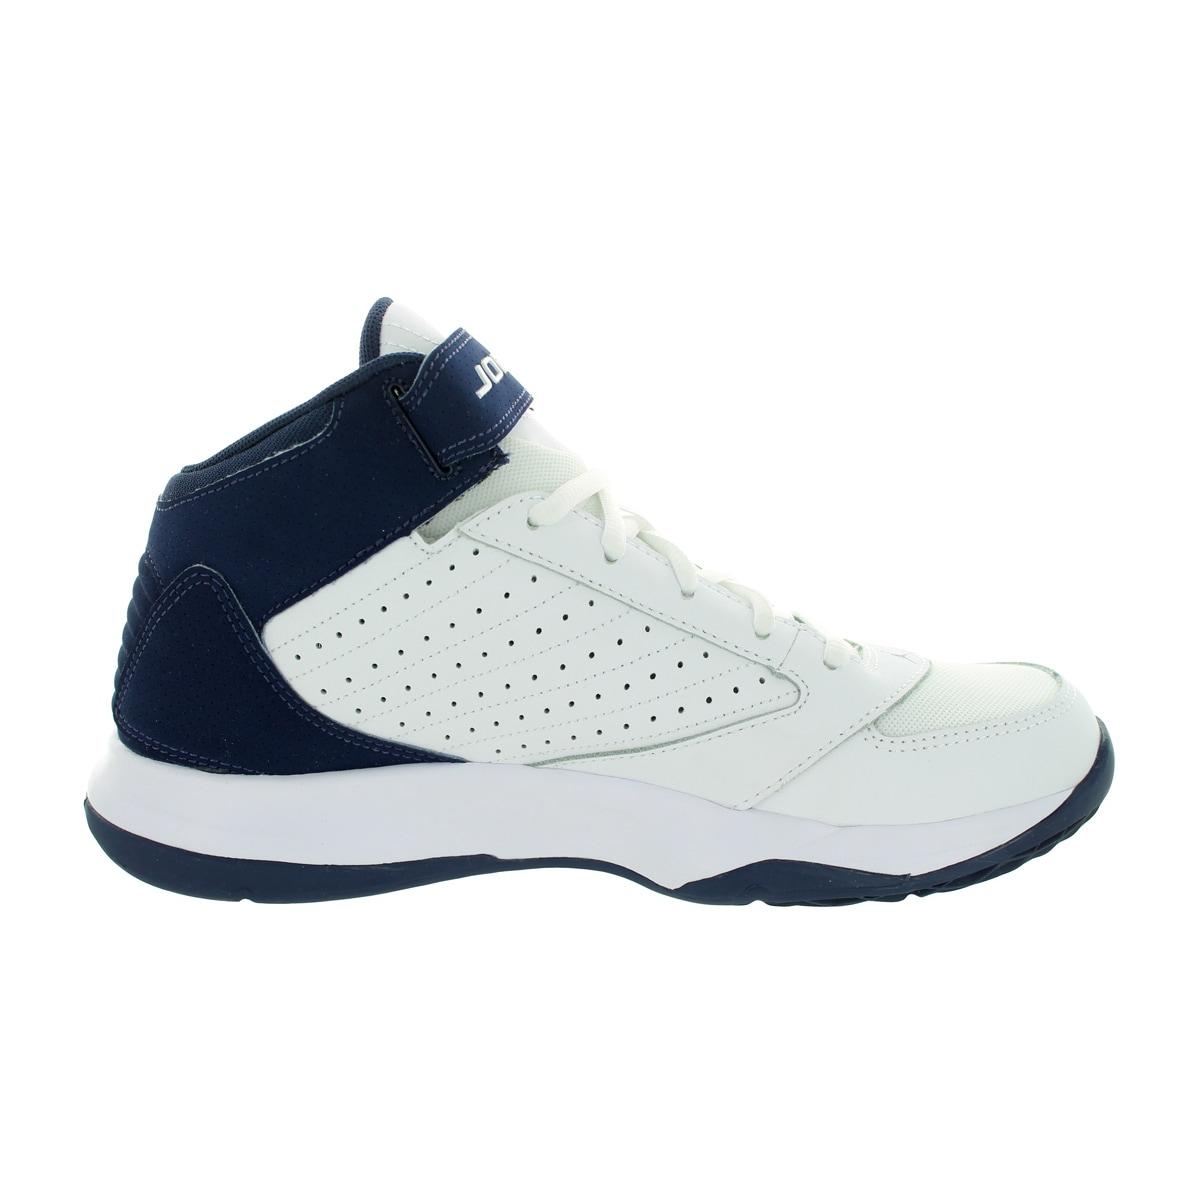 new arrival c11d5 acc42 Shop Nike Jordan Men s Jordan Bct Mid 3 White White Midnight Navy  Basketball Shoe - Free Shipping Today - Overstock - 12318584